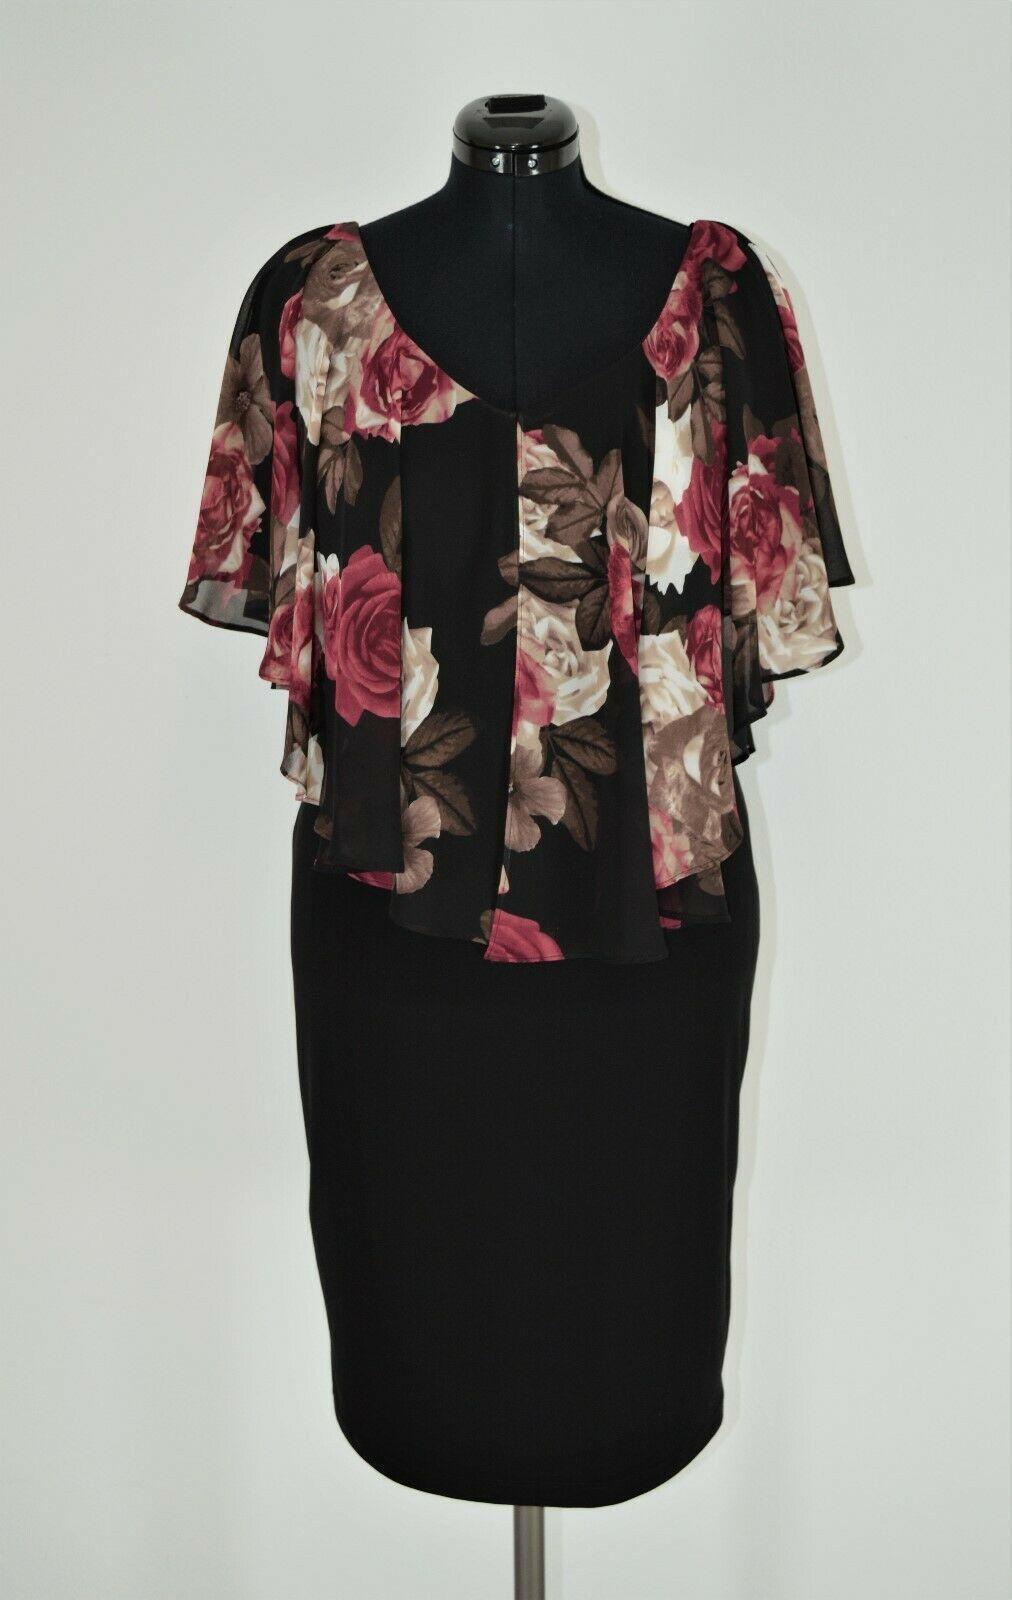 NEU! Joseph Ribkoff Kleid 14 Gr. 14 14 schwarz-bunt Ortex